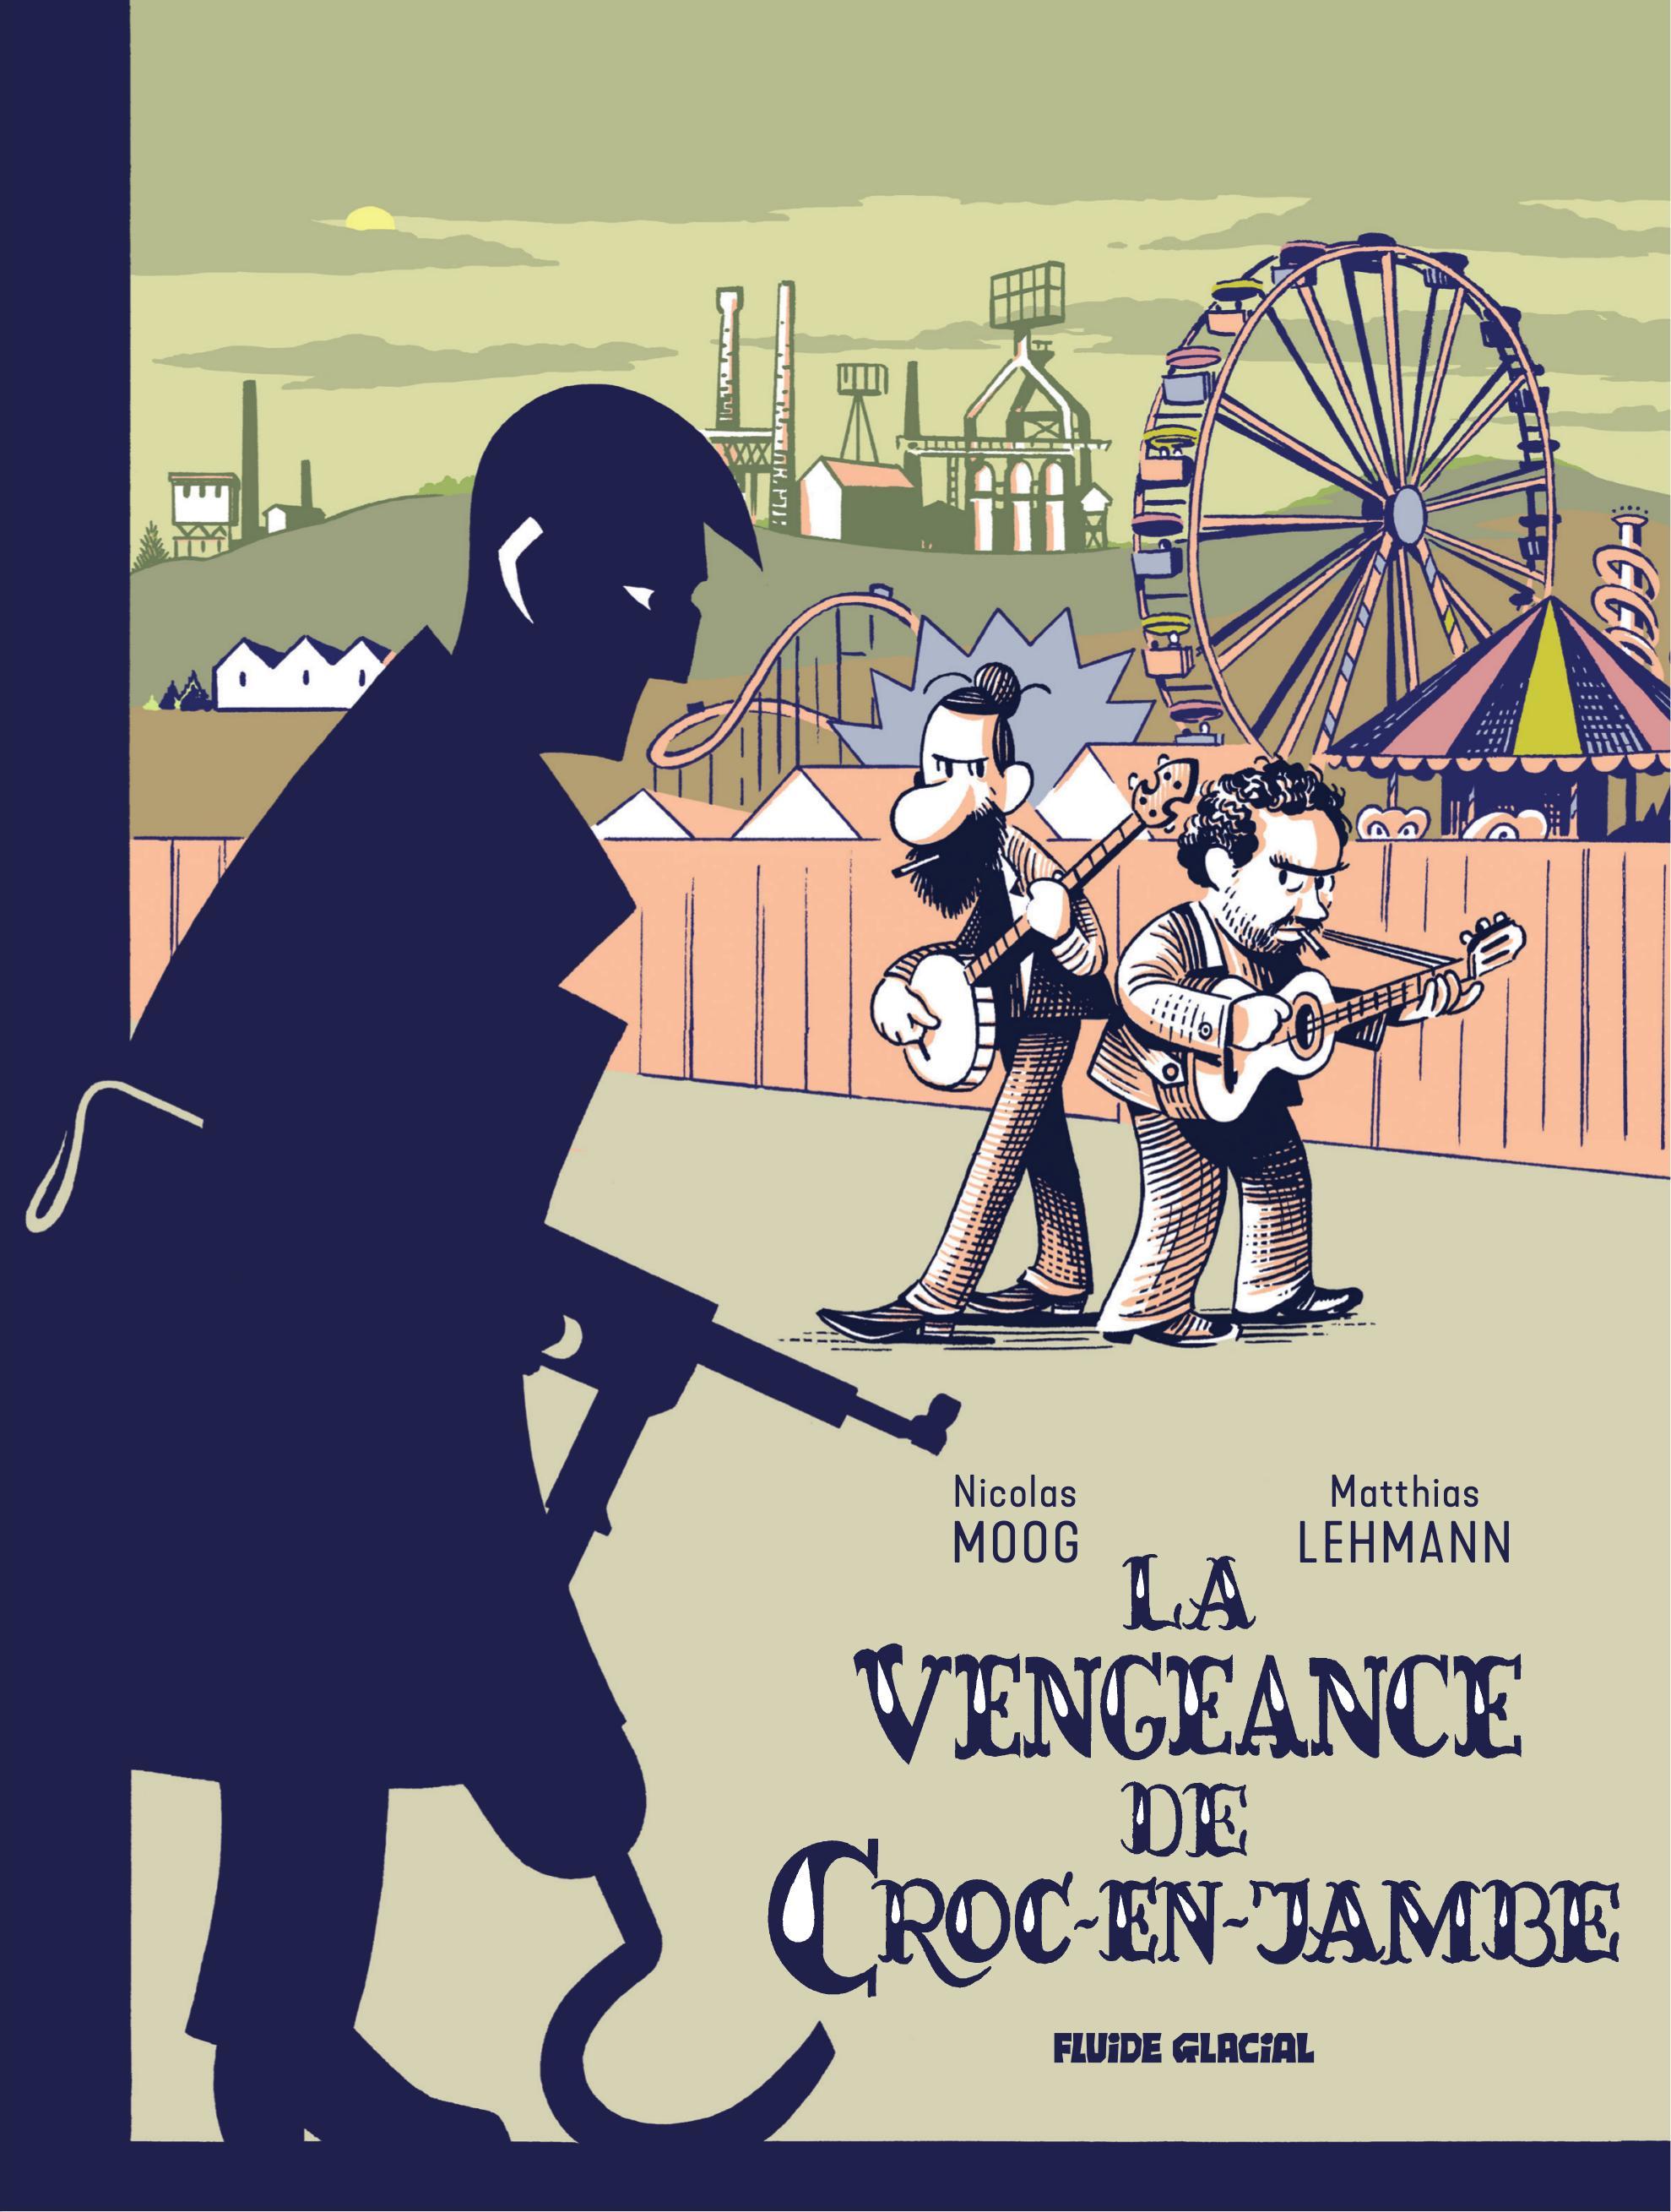 La Vengeance de croc-en-jambe 1 - La Vengeance de croc-en-jambe